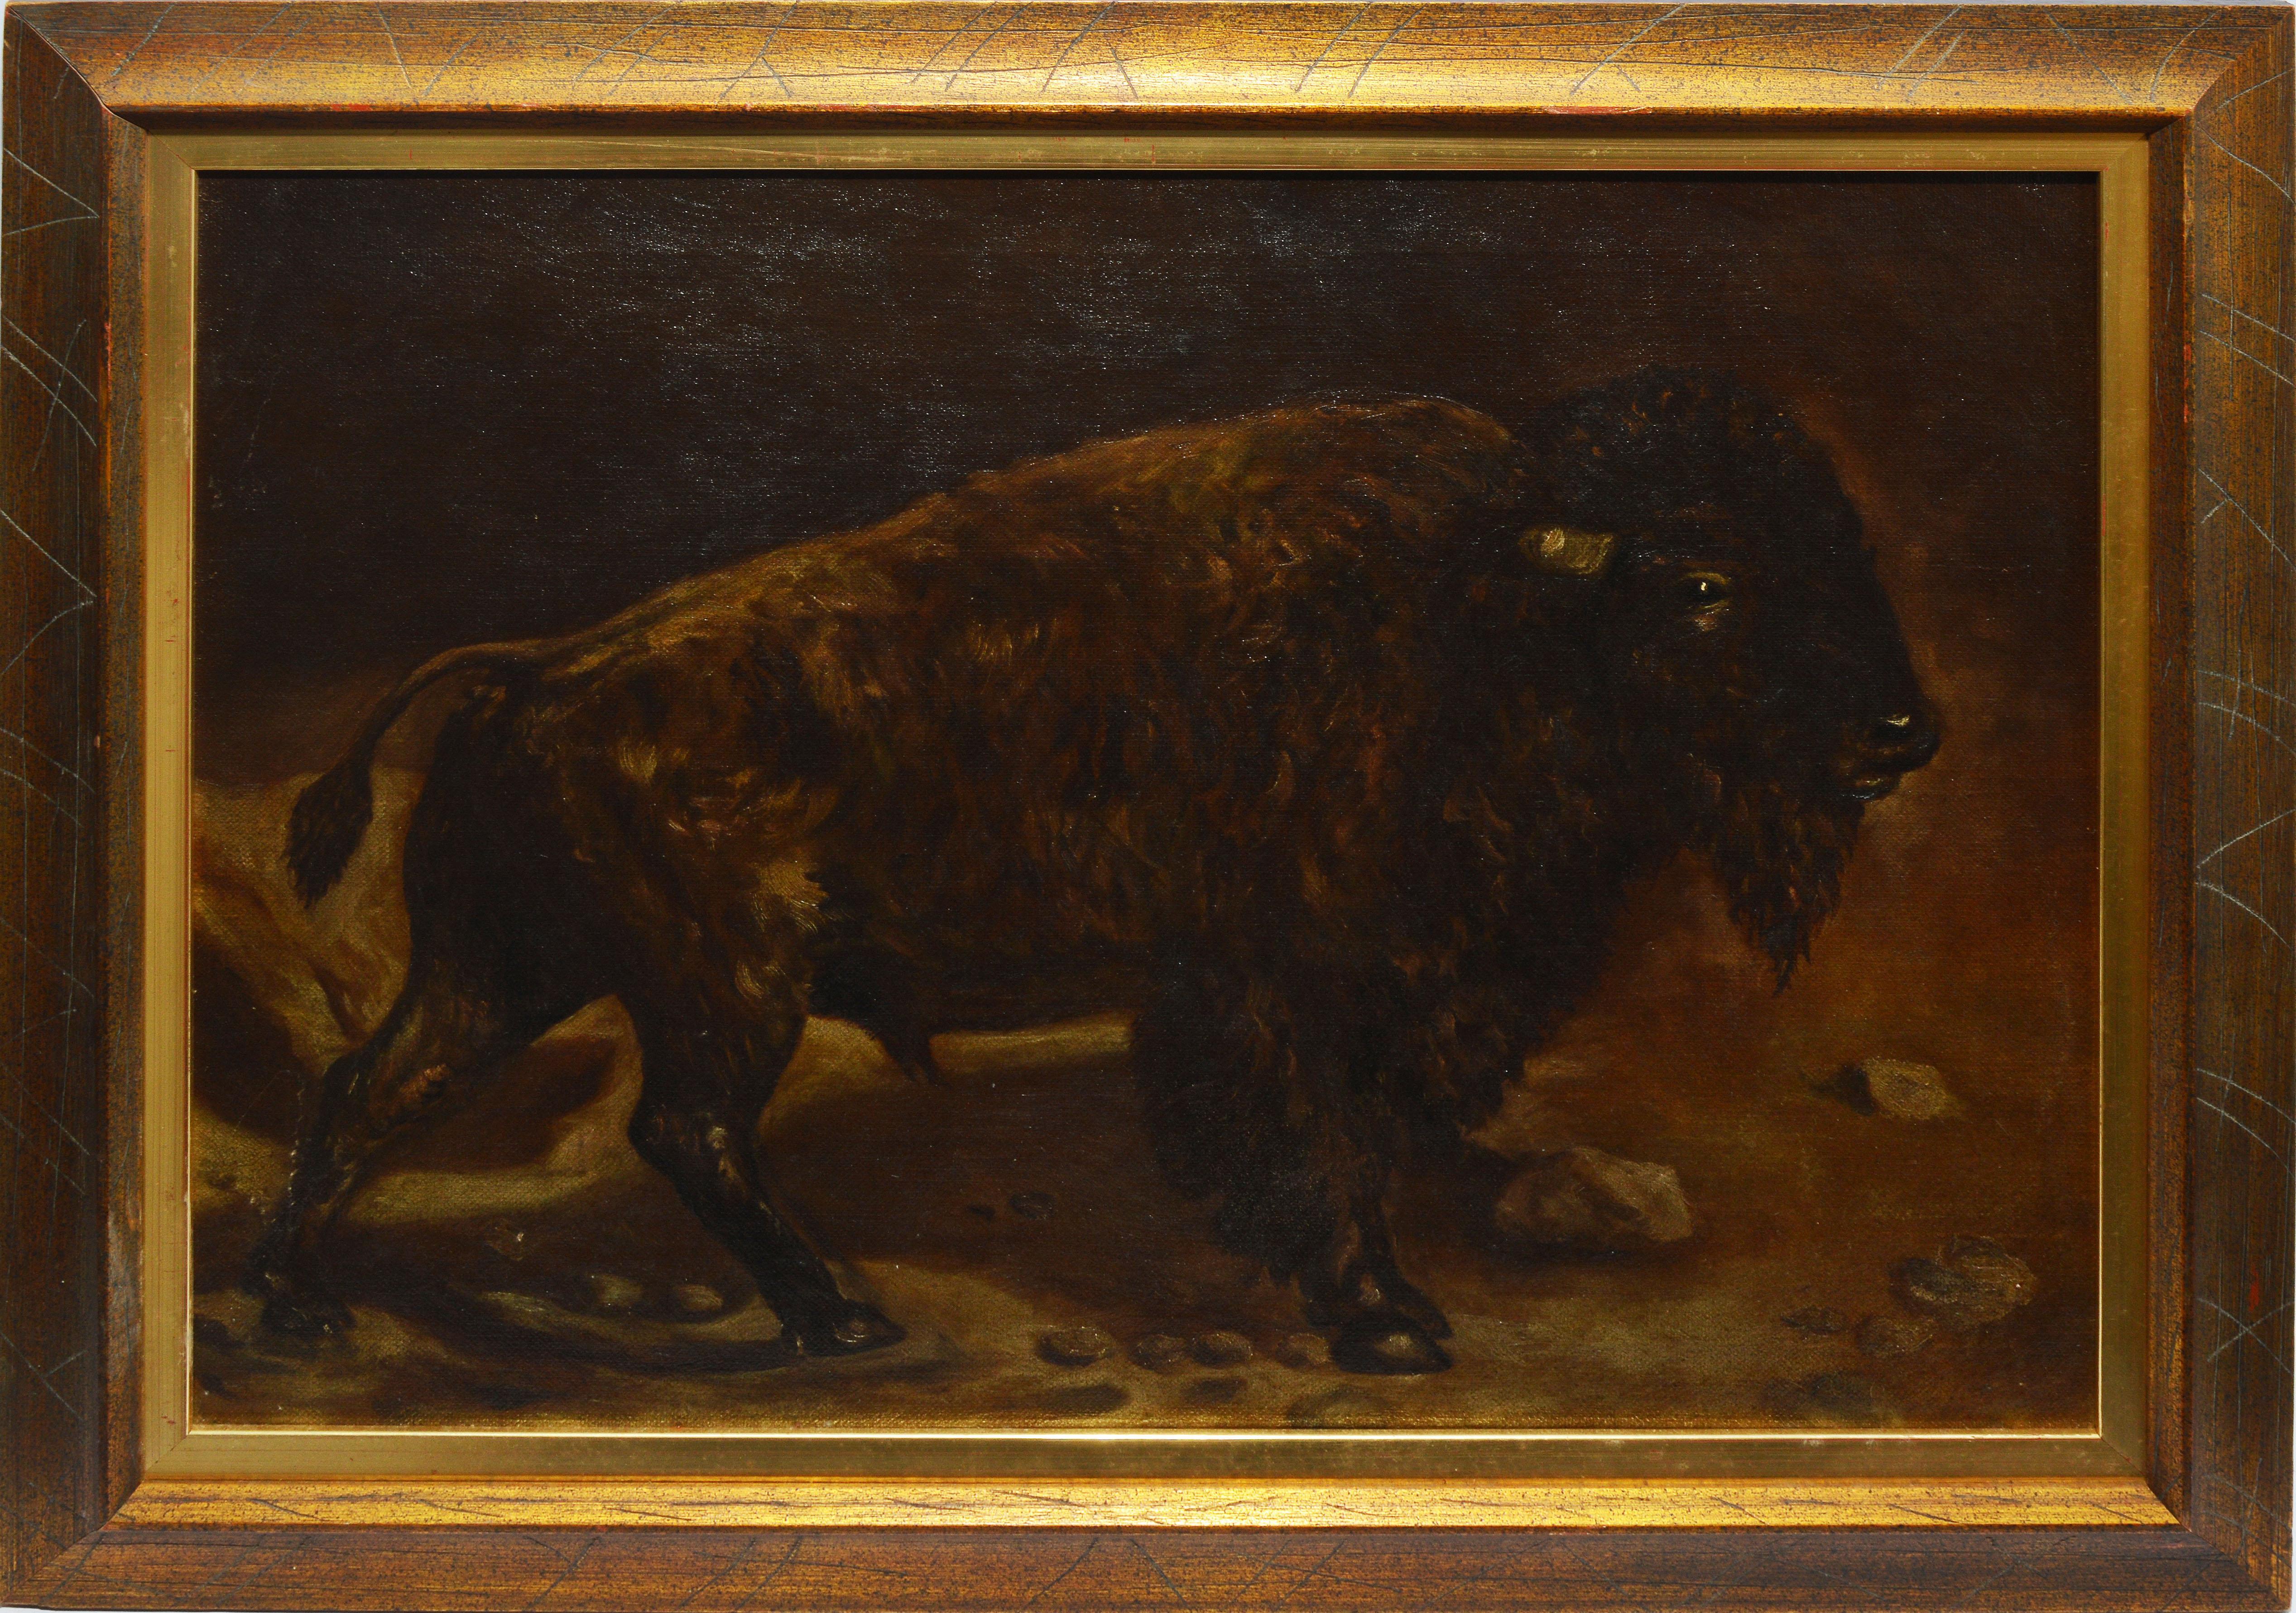 Buffalo With A Grass Folk Art Painting